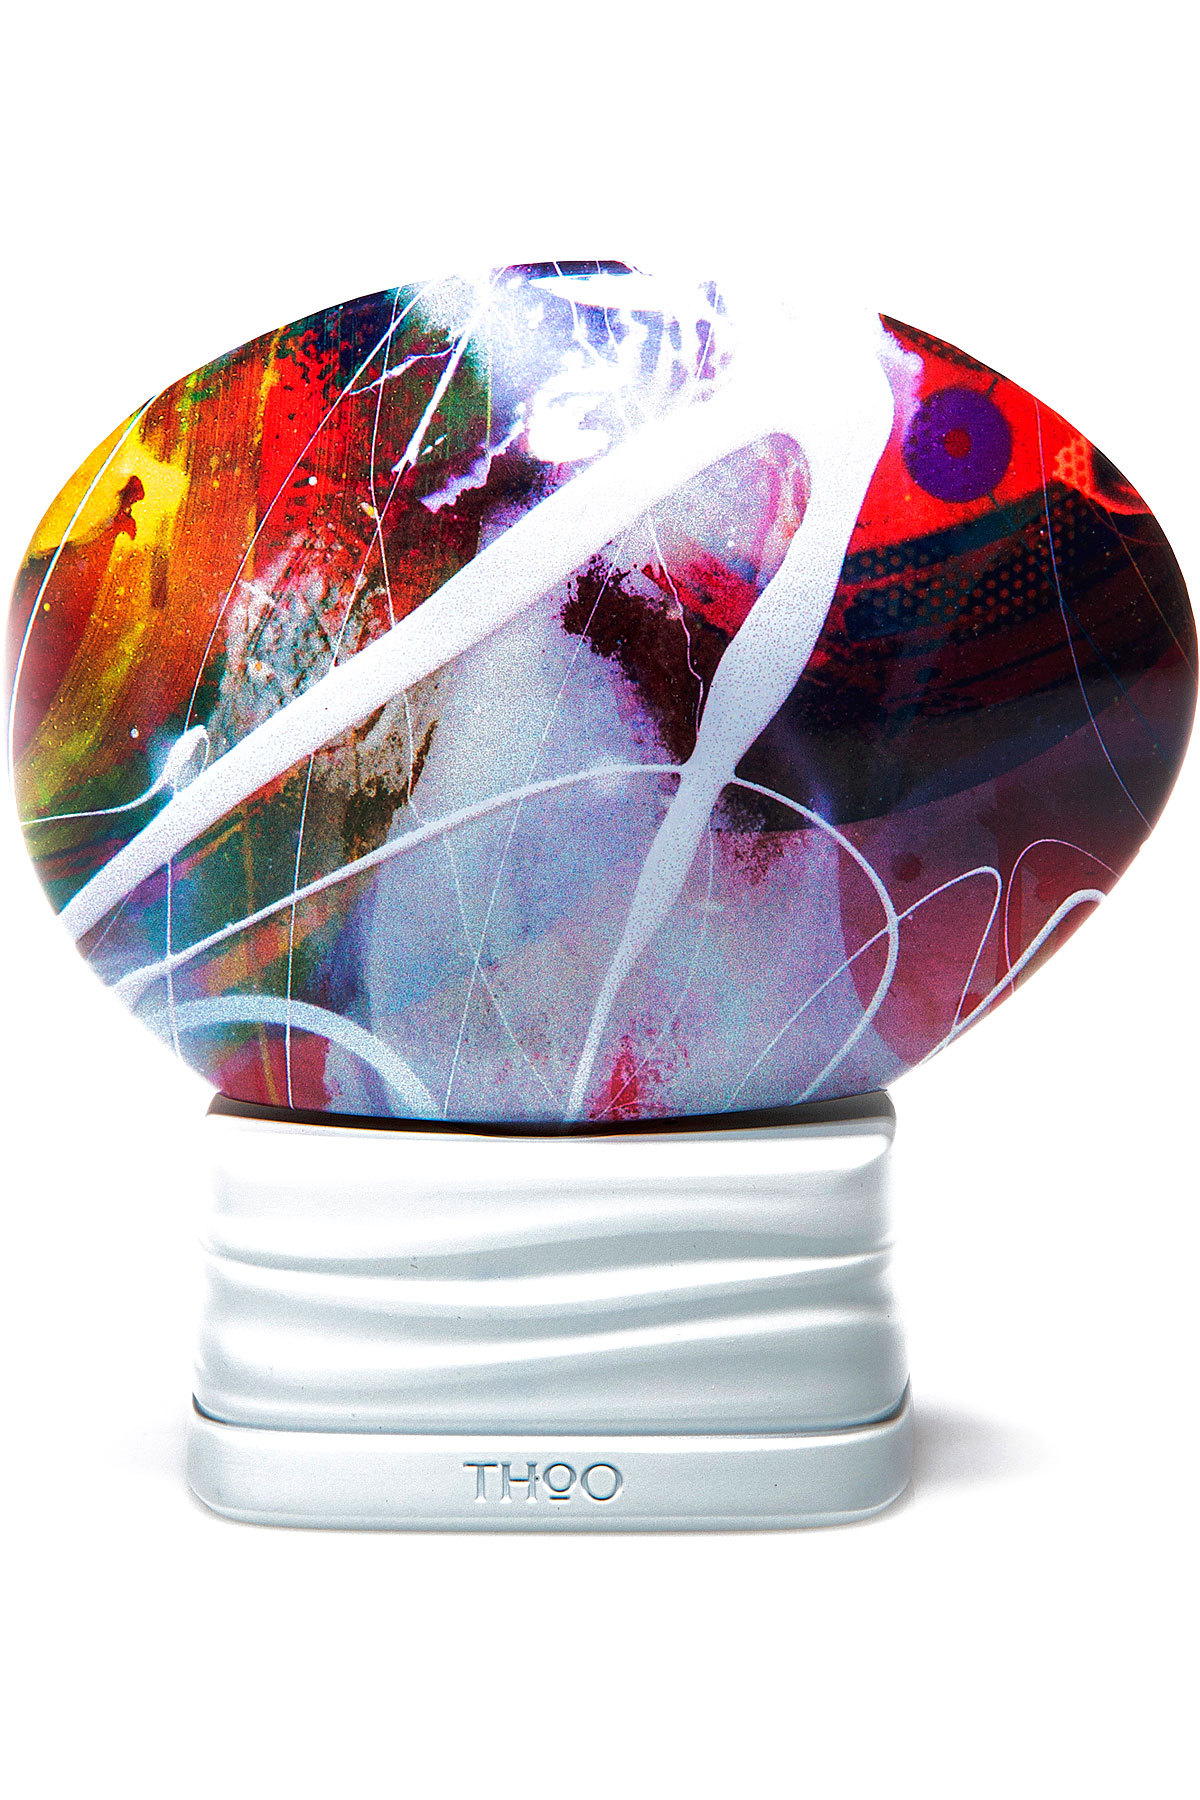 The House Of Oud Fragrances for Men, Thoo Collection - Each Other - Eau De Parfum - 75 Ml, 2019, 75 ml